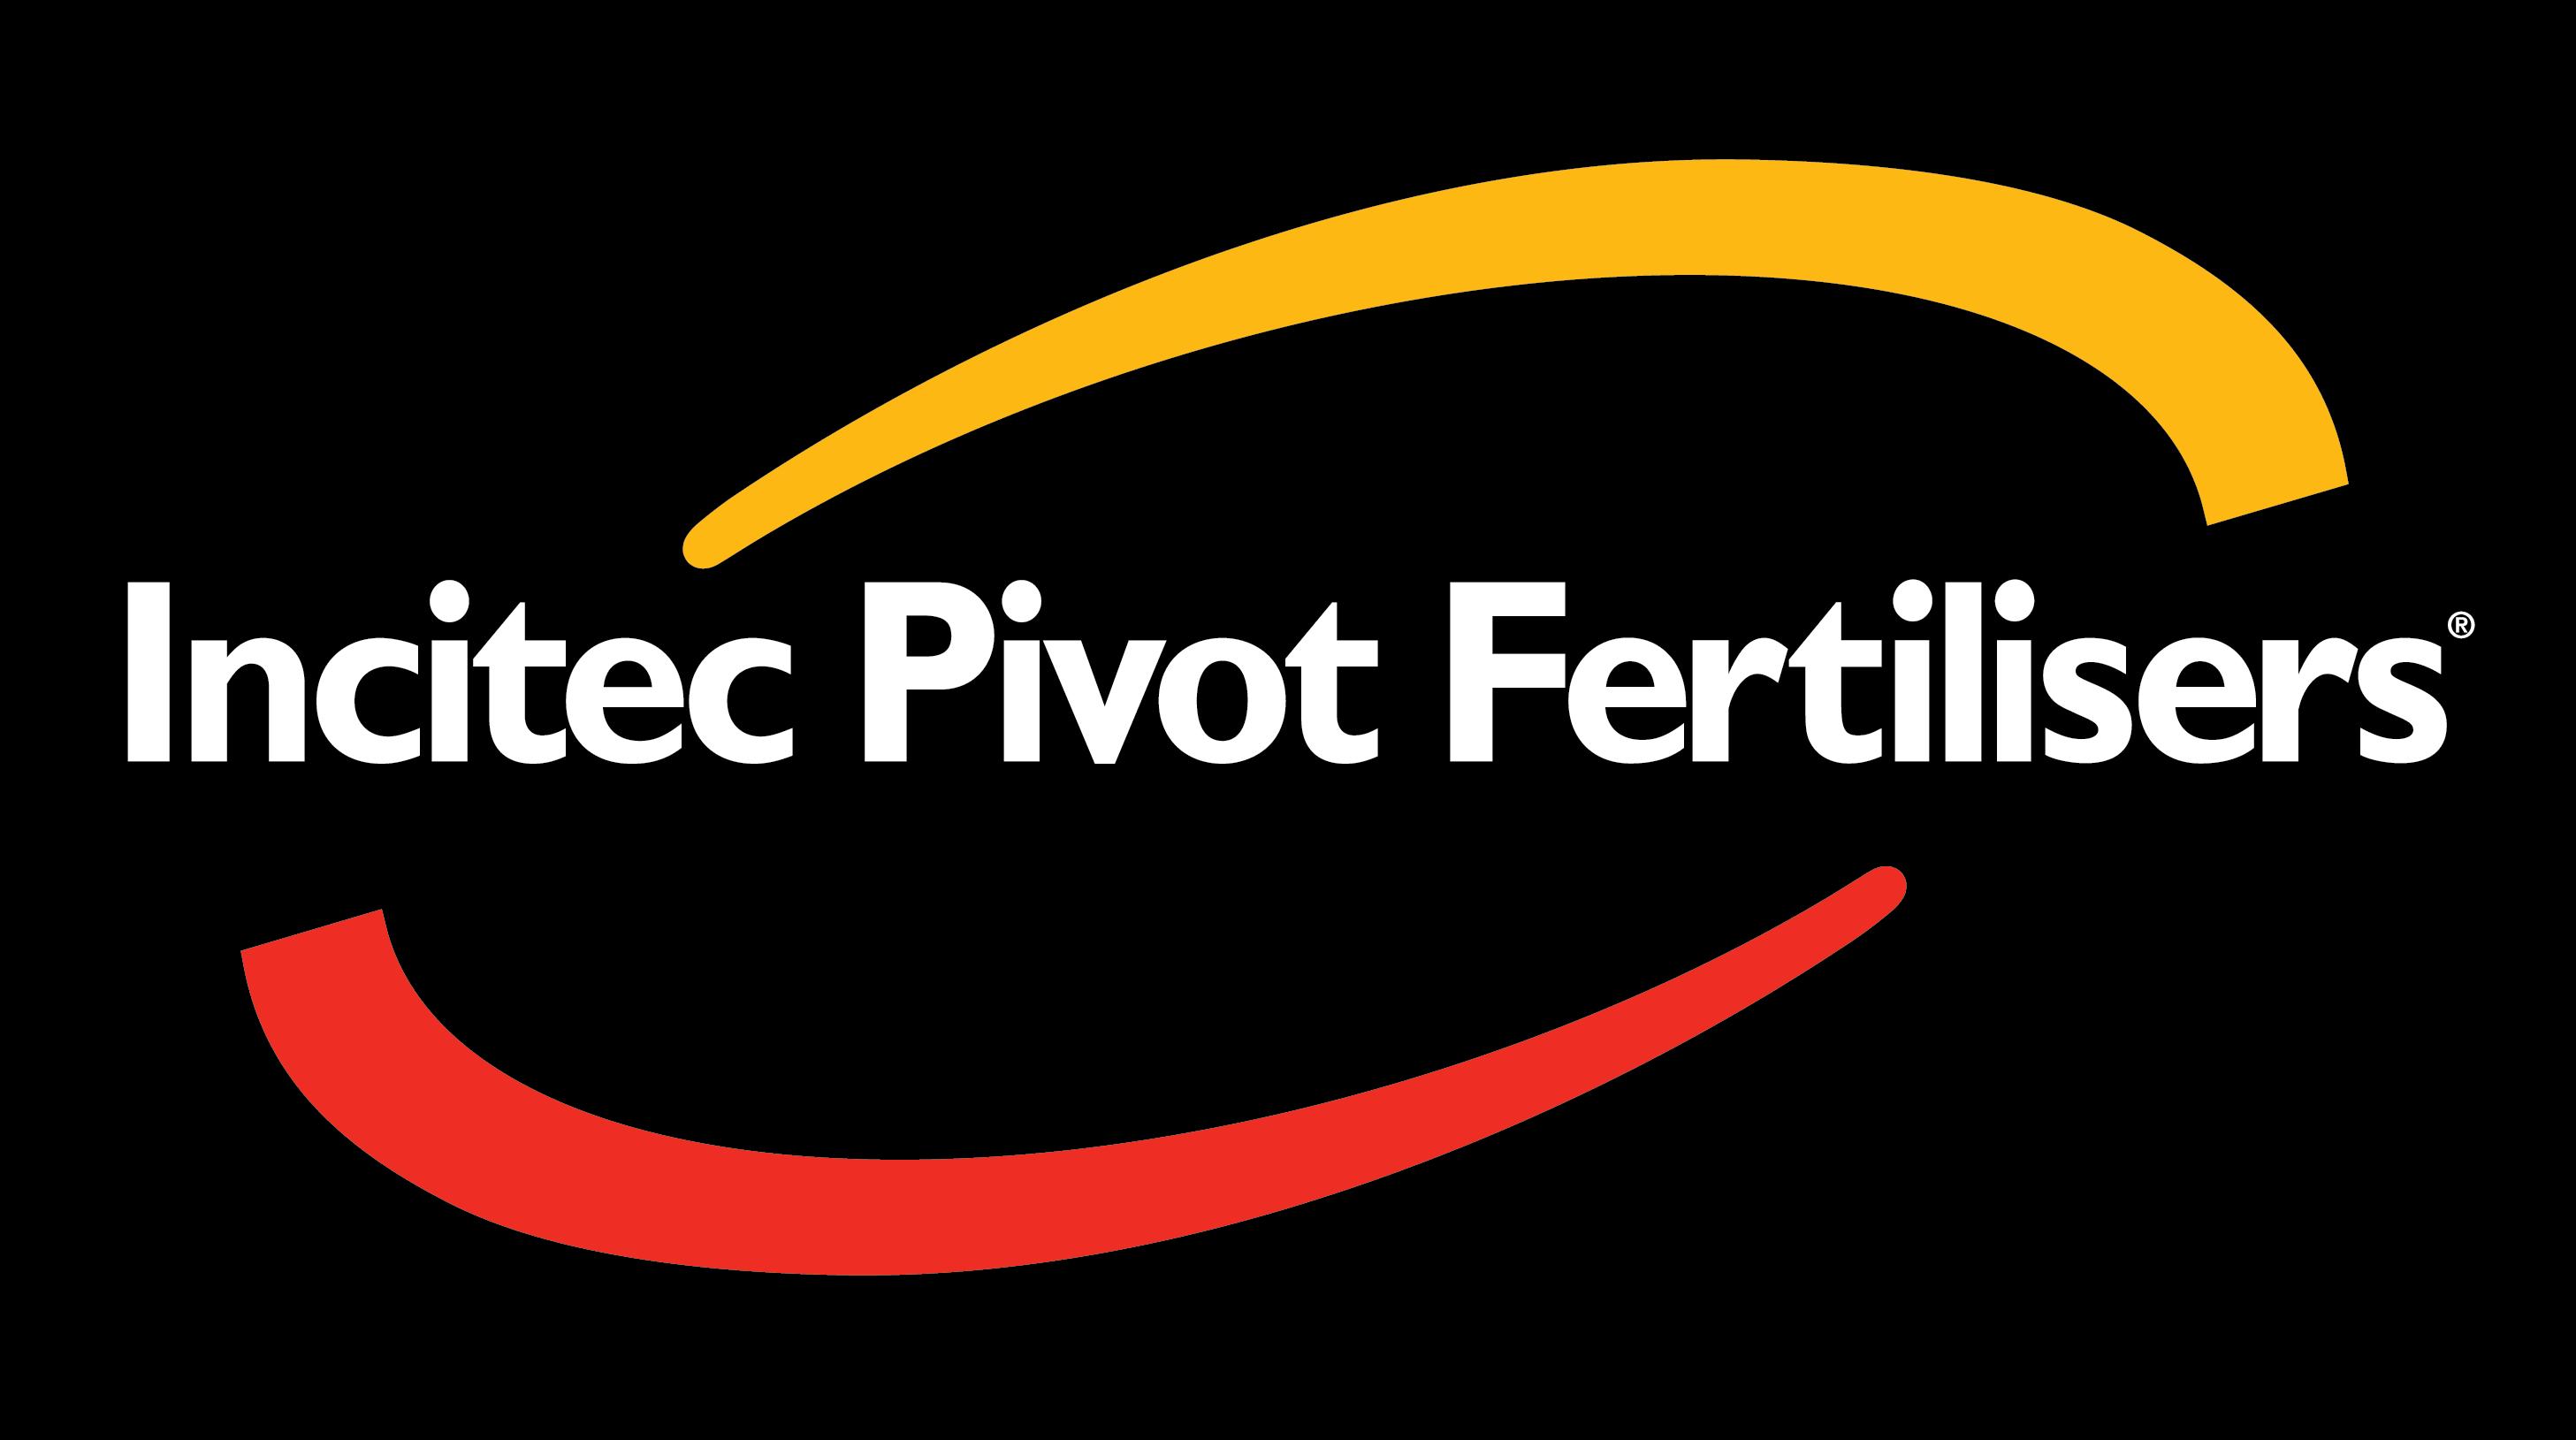 Incitec Pivot Fertilisers